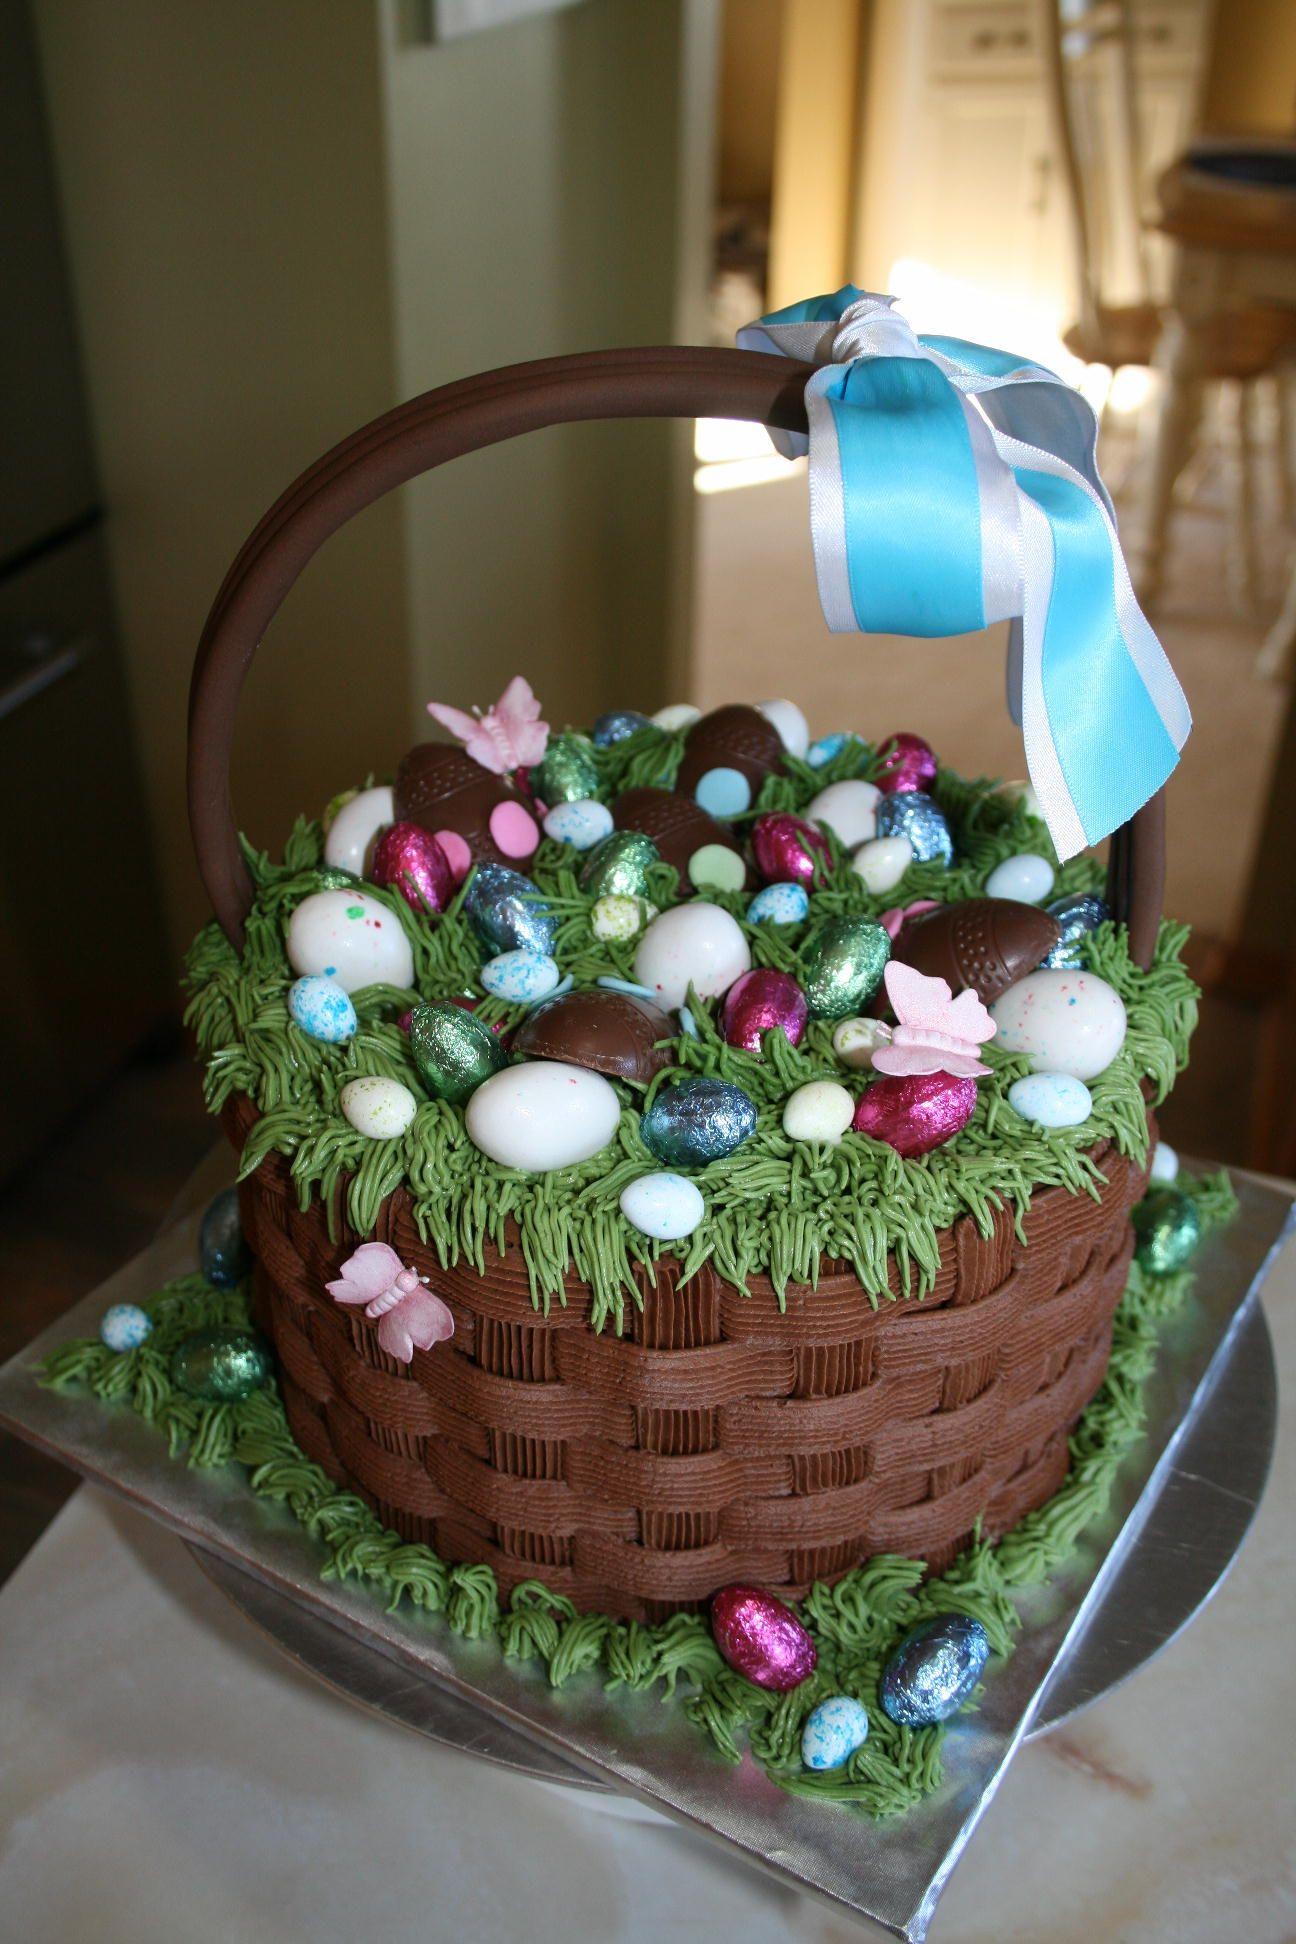 Rose Glen Appreciation Chocolate Buttercream Basket Weave Design